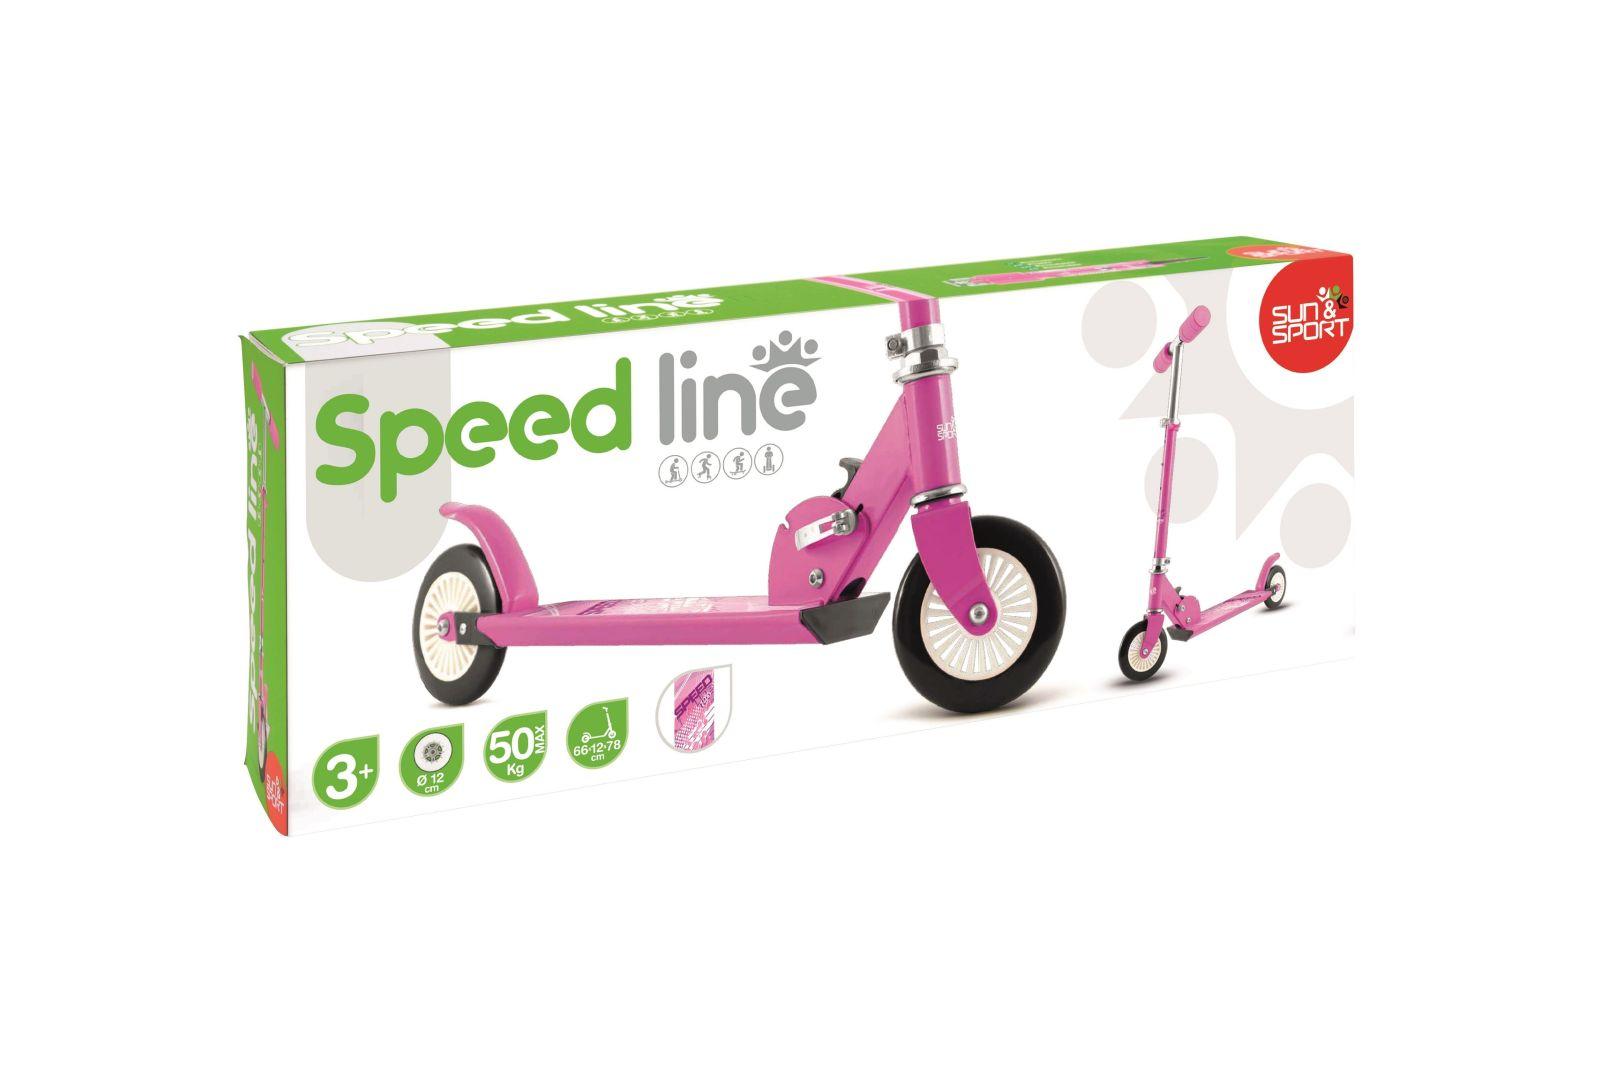 Monopattino speed line - girl - SUN&SPORT